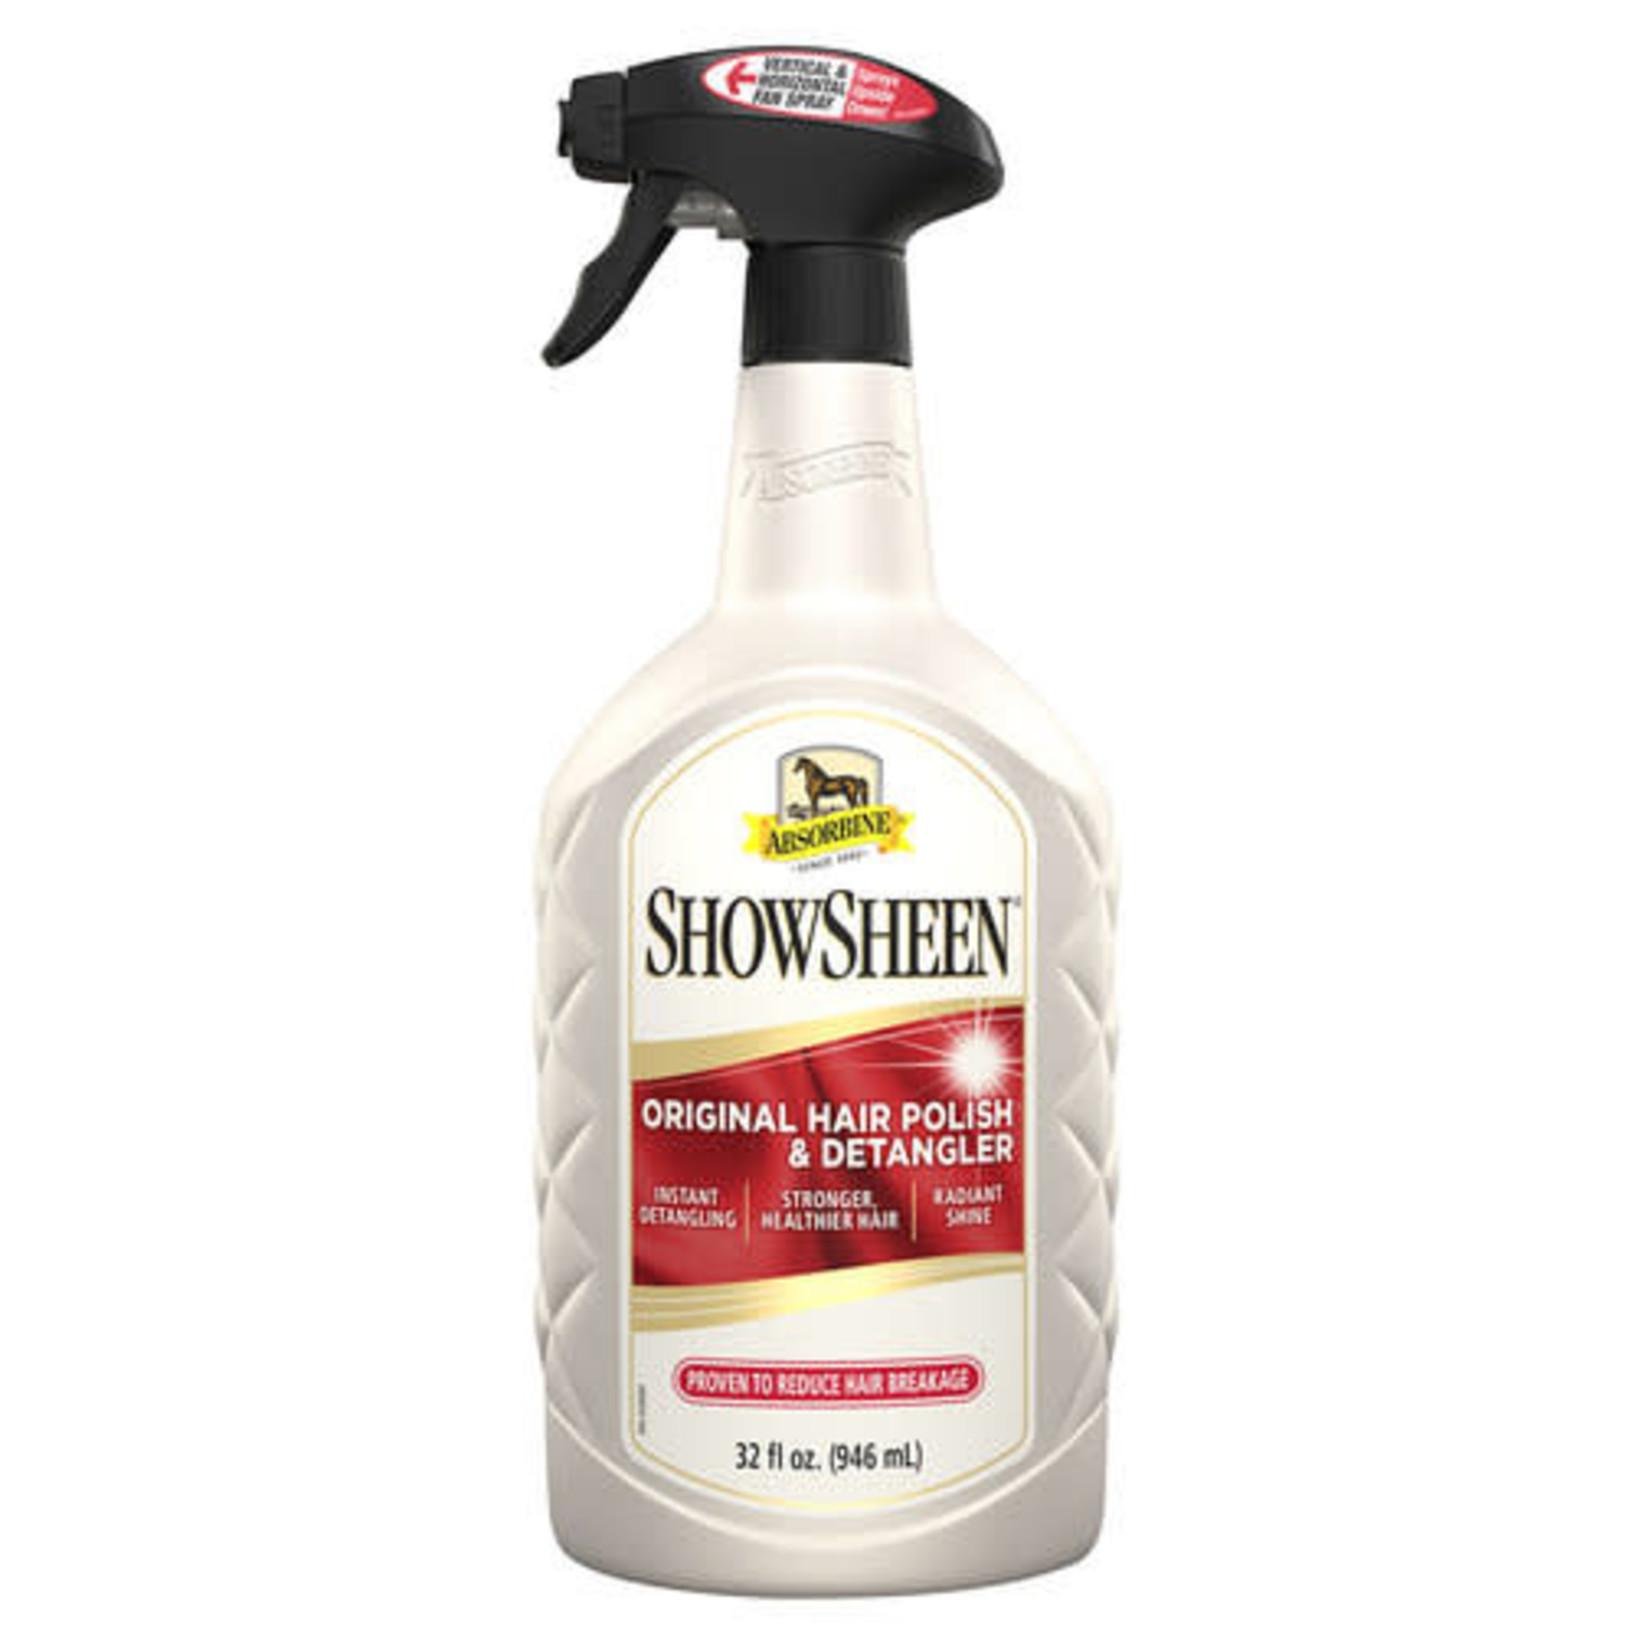 ShowSheen Original Hair Polish & Detangler